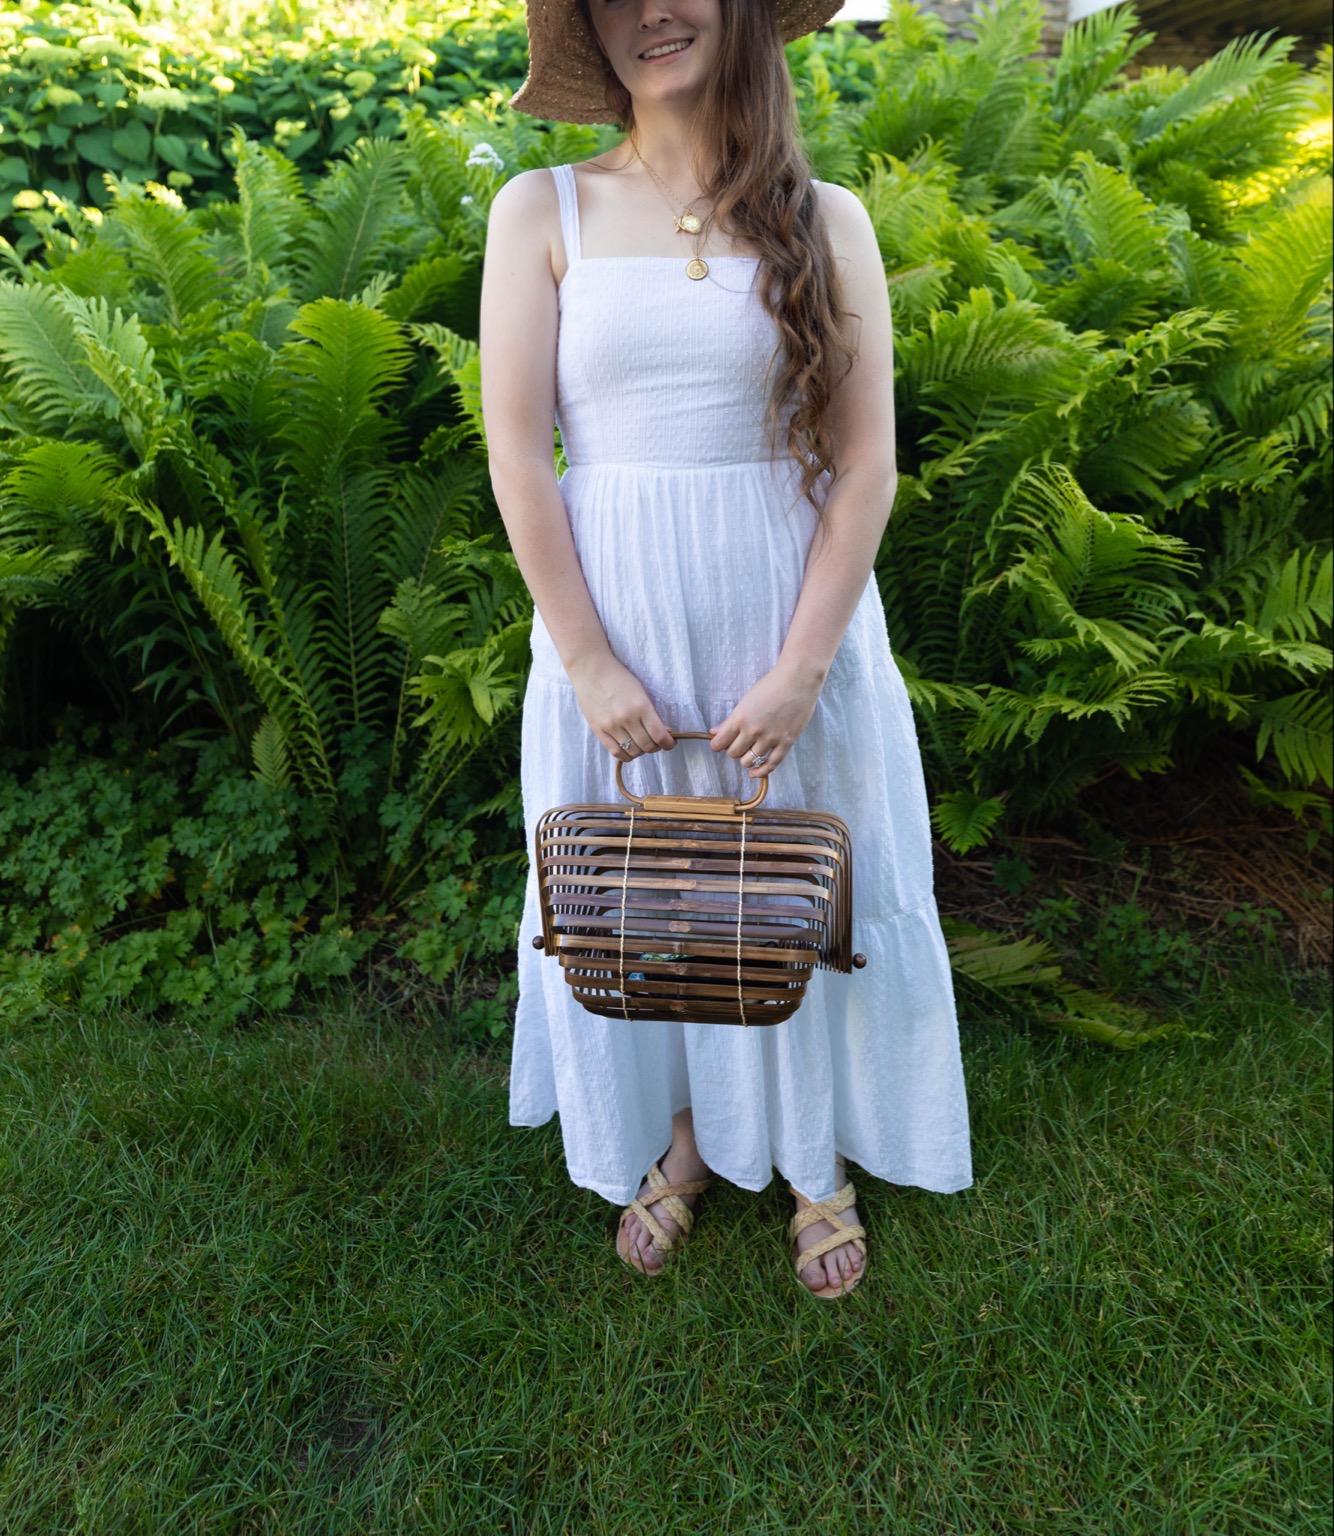 A Breezy White Swiss Dot Duffield Lane Maxi Dress Cult Gaia Basket Bag Wooden Shell Earring by Annie Fairfax